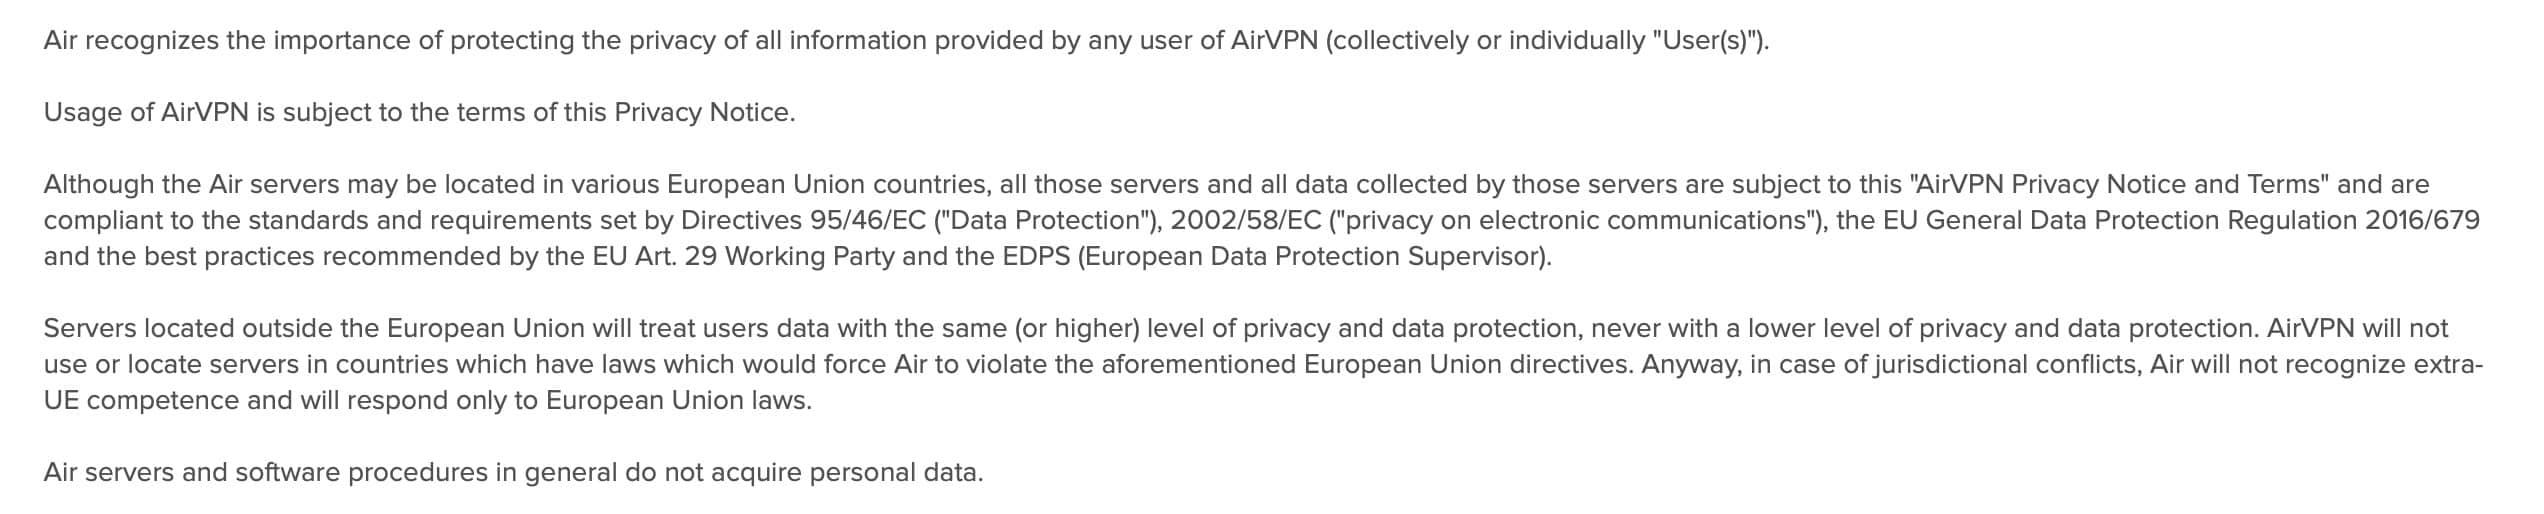 AirVPN - Privacy Policy 1